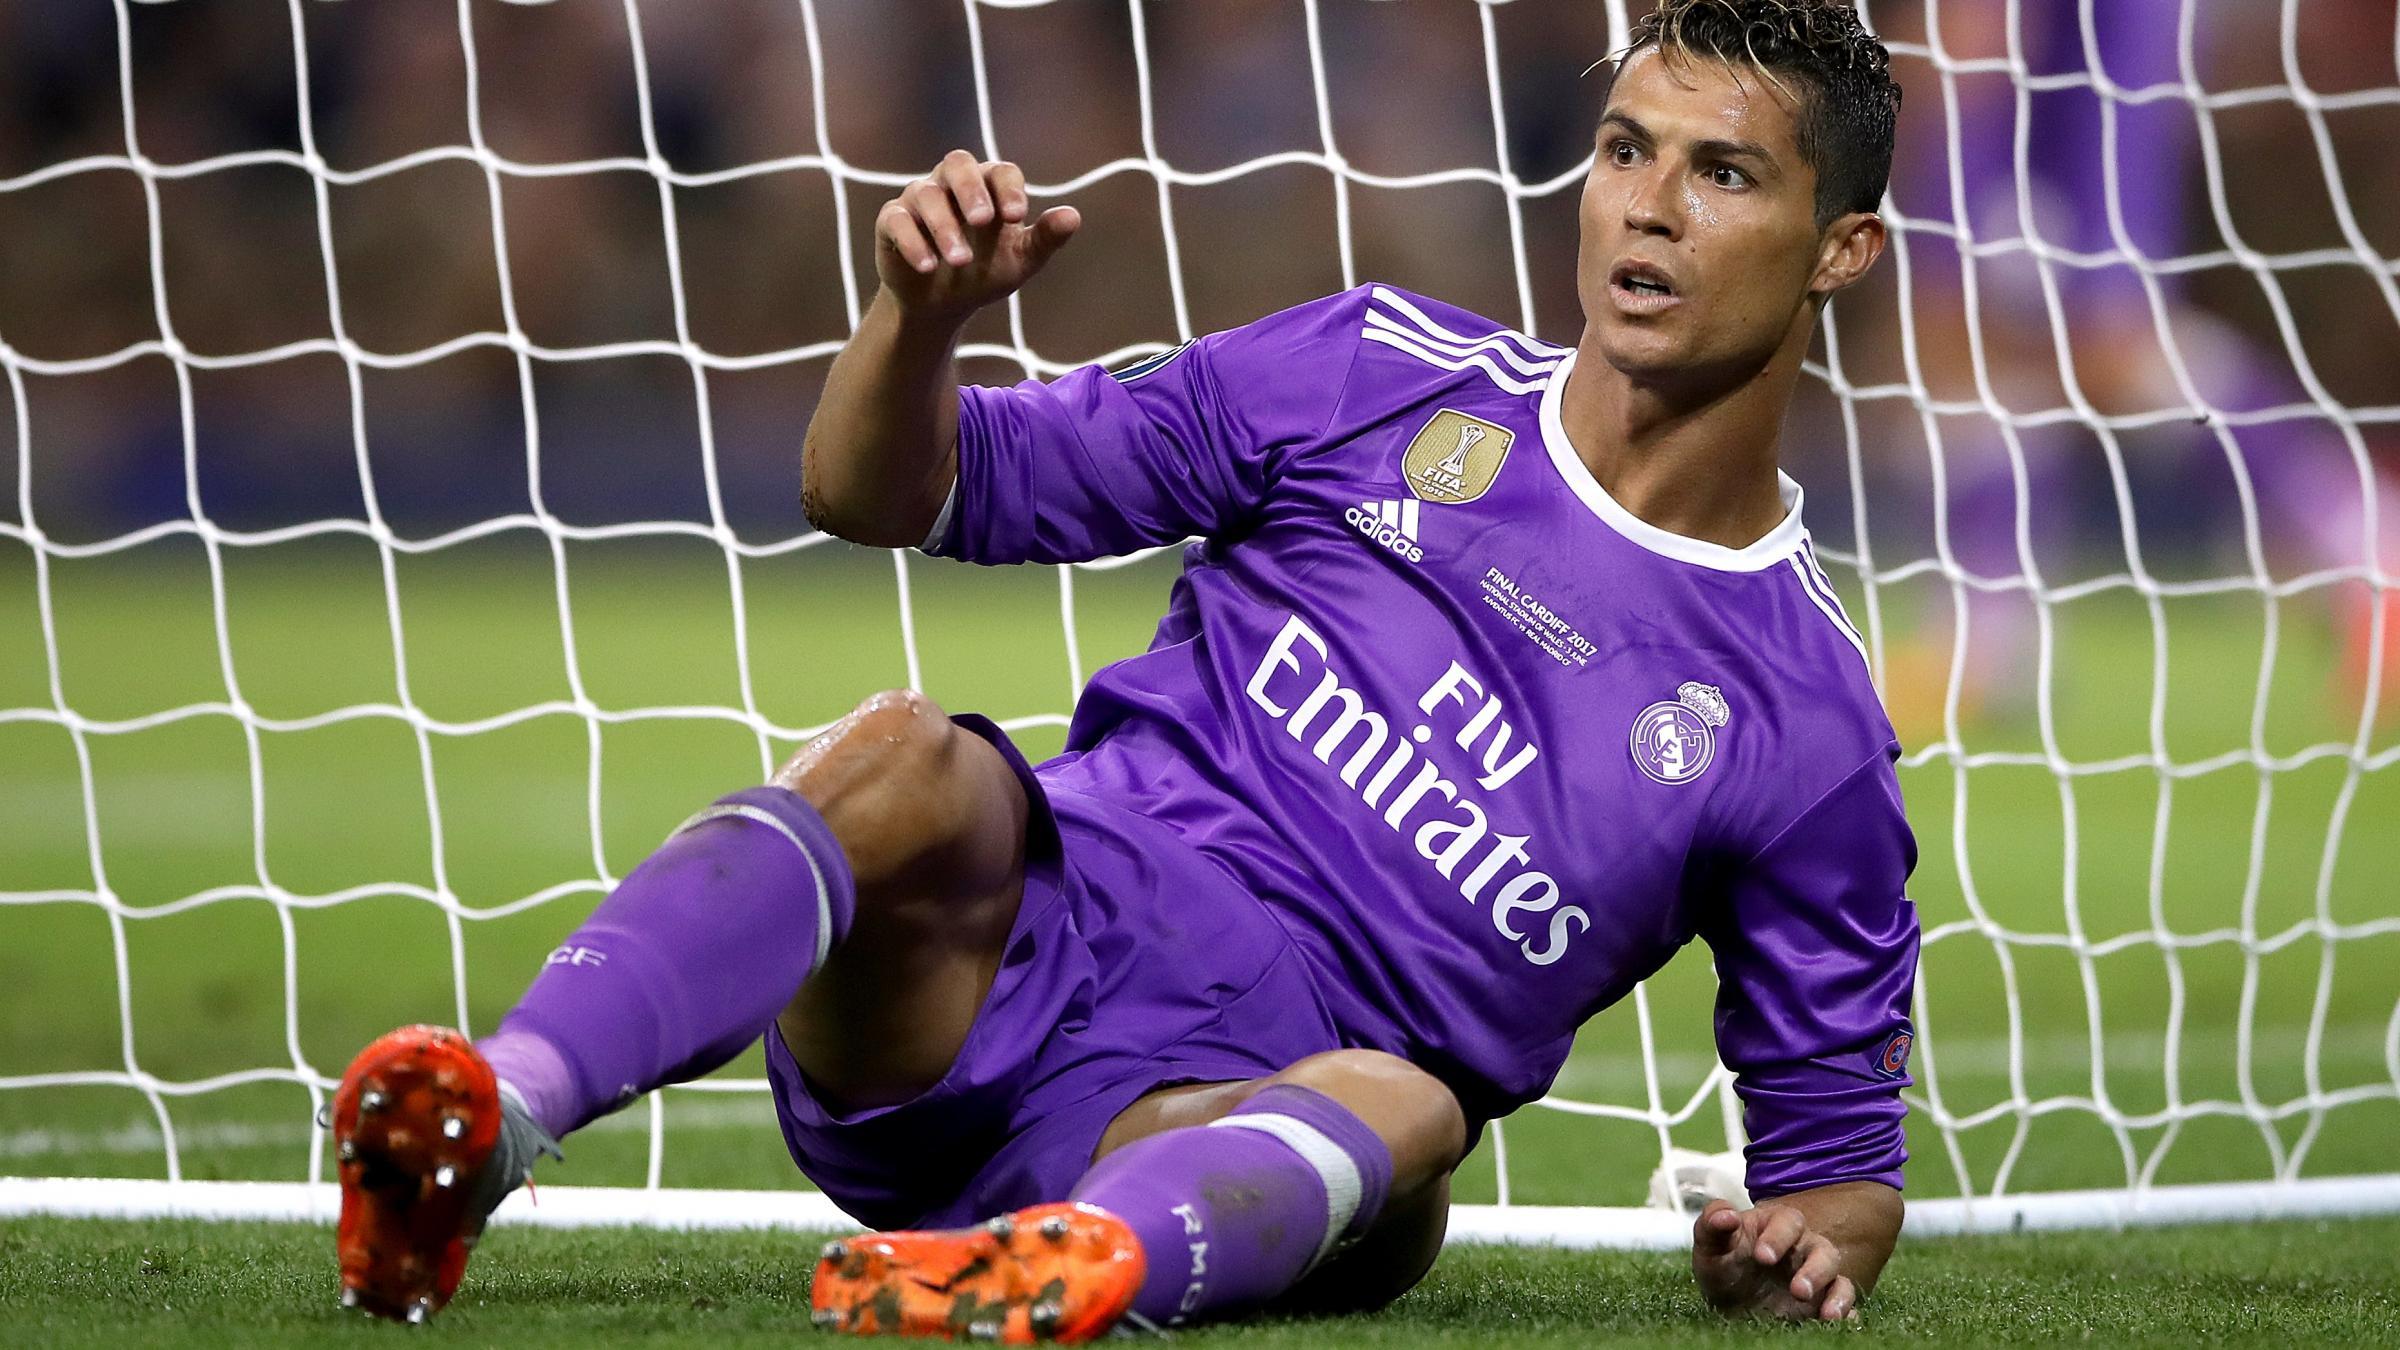 Cristiano Ronaldo accused of tax fraud by Spanish state prosecutor